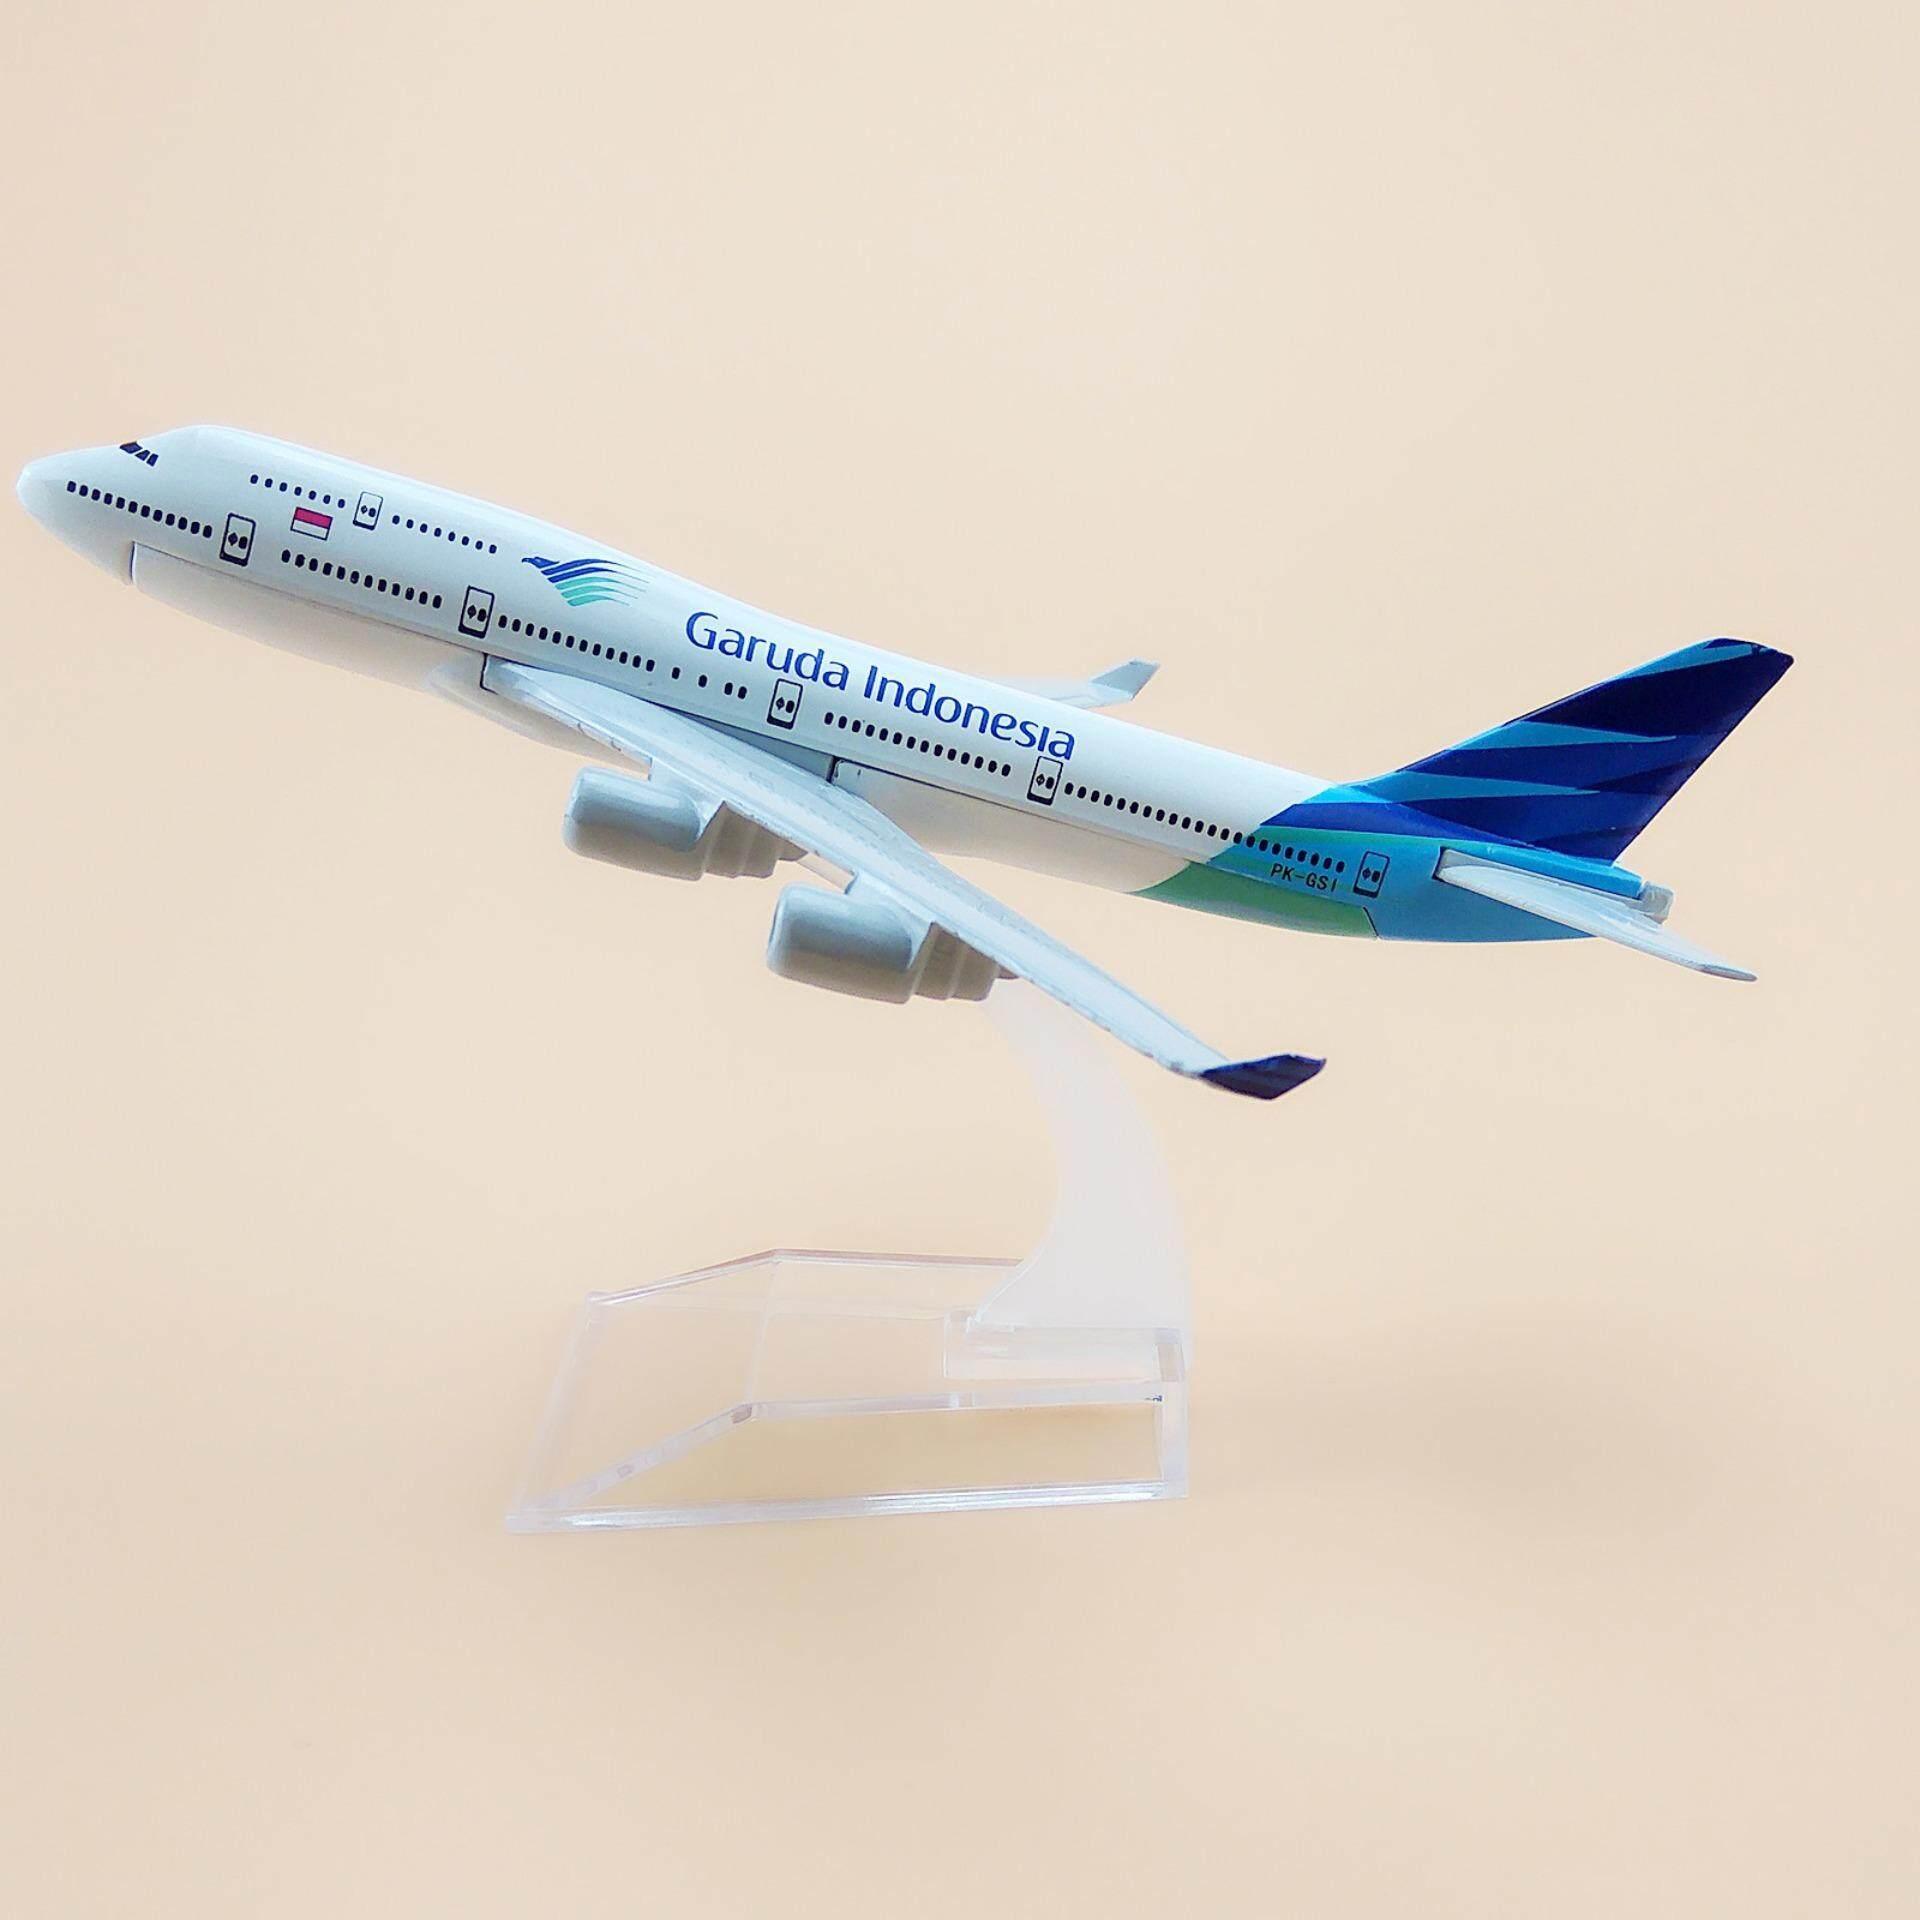 Air Garuda Indonesia Boeing 747 B747 Airlines Aircraft 16cm Metal Airplane Model Plane Kids Gift Toy